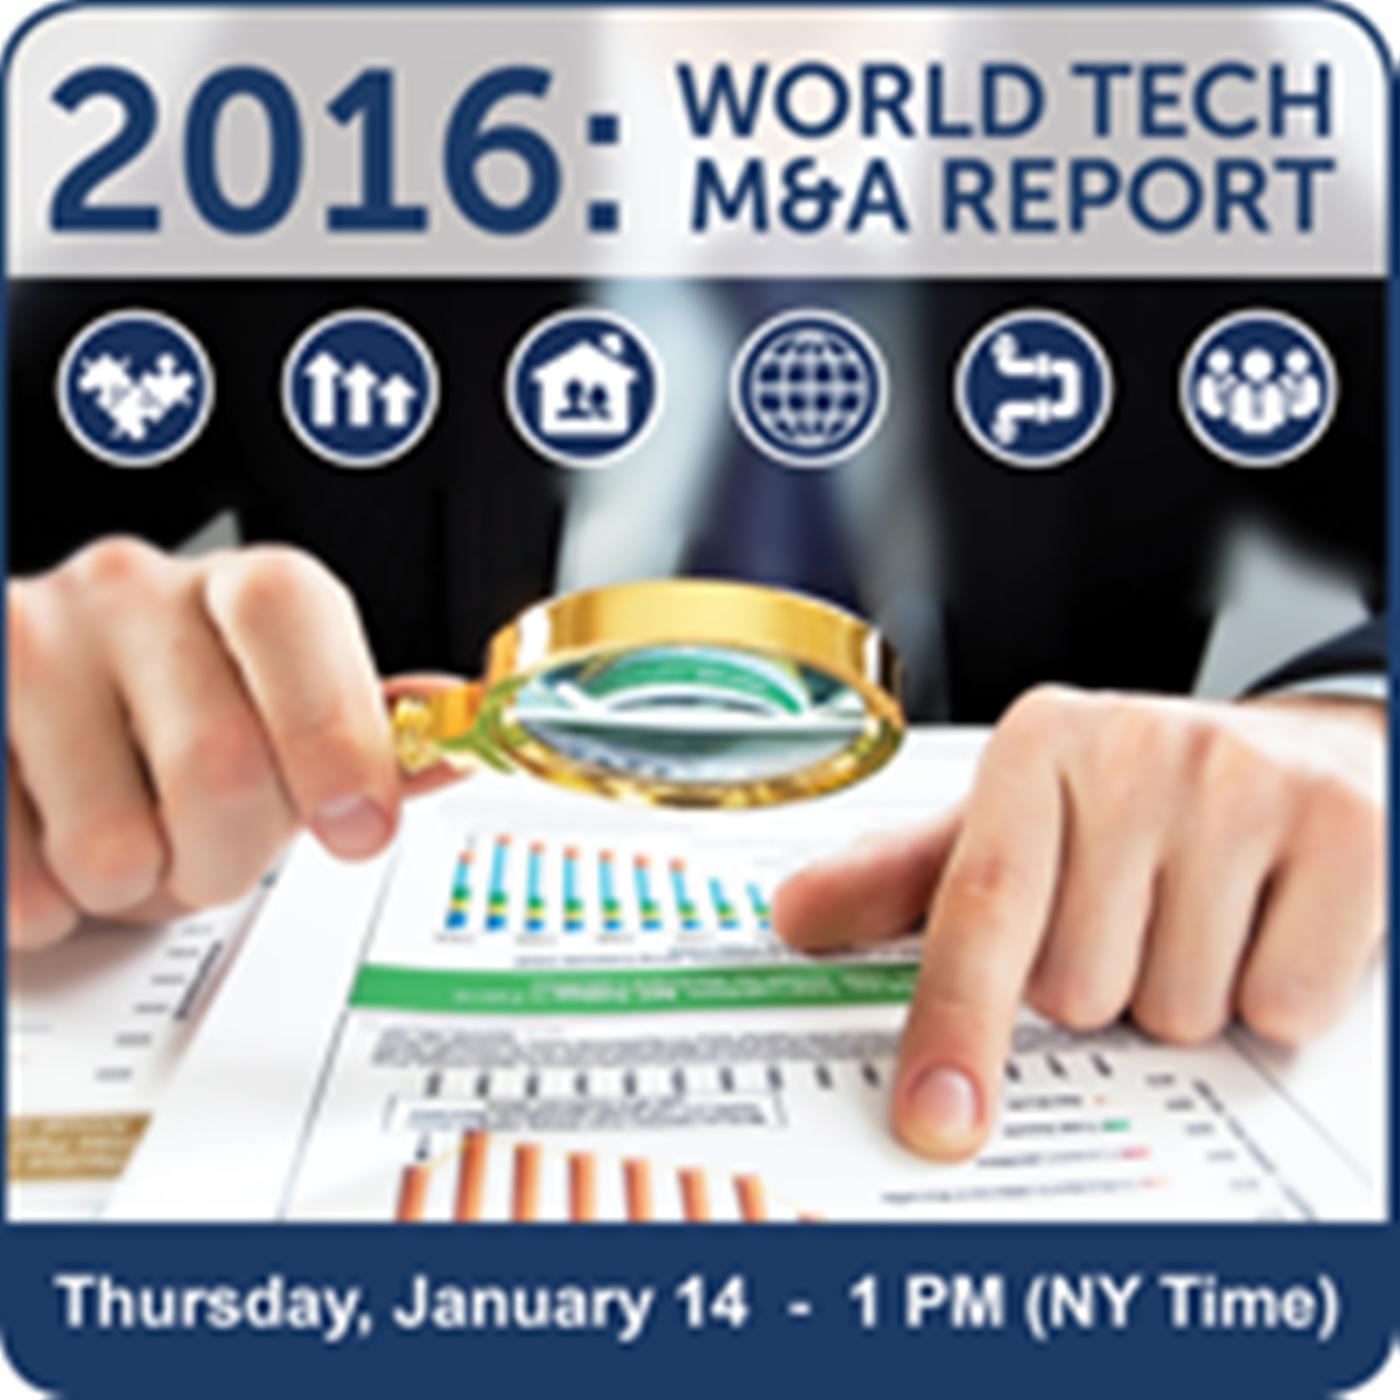 Tech M&A Annual Report: Top 10 Disruptive Tech Trends #5 & 6